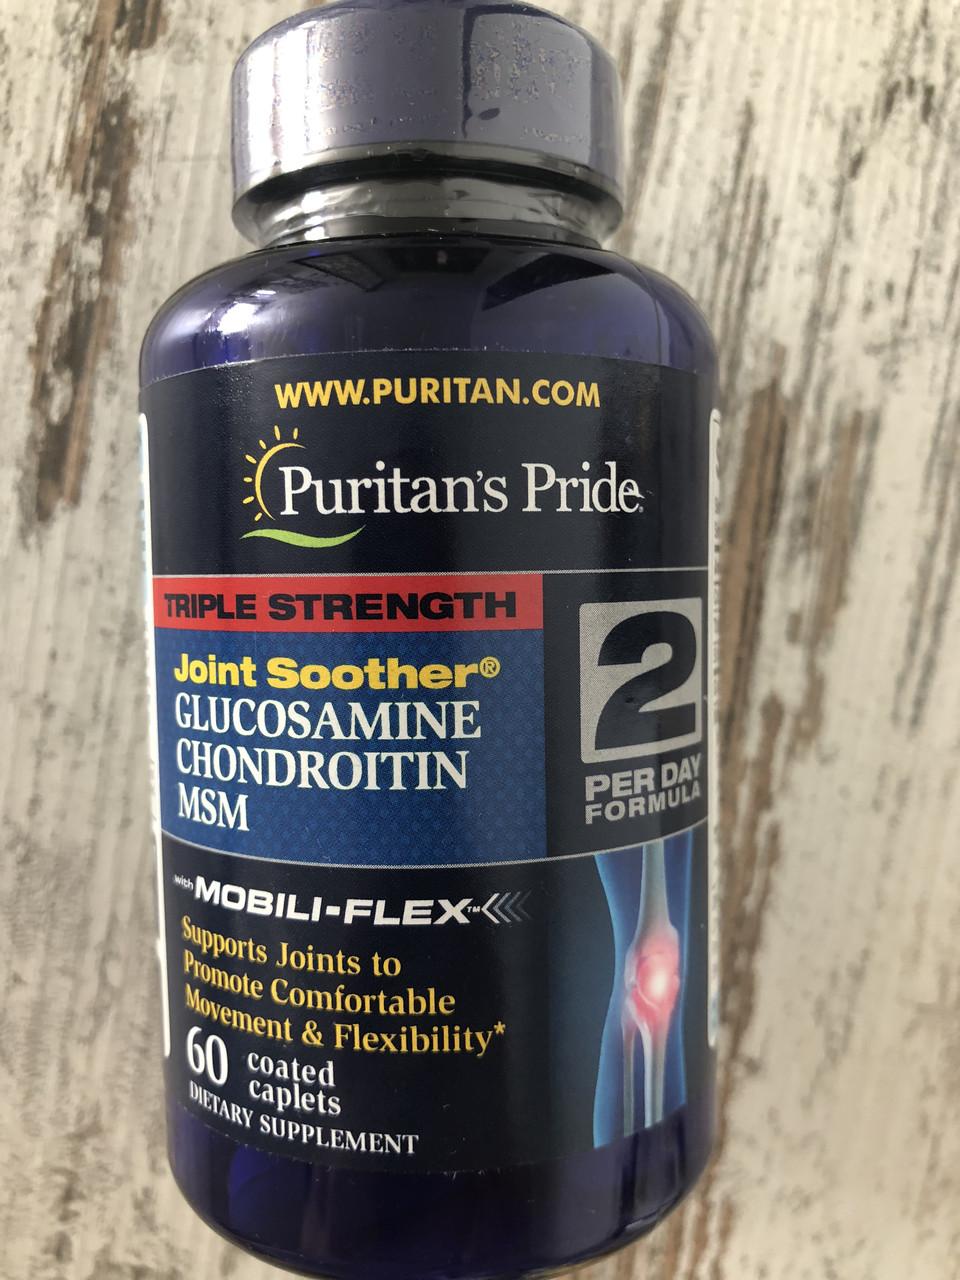 Усиленный Глюкозамин, хондроитин, MSM от PURITAN´S PRIDE, 60шт